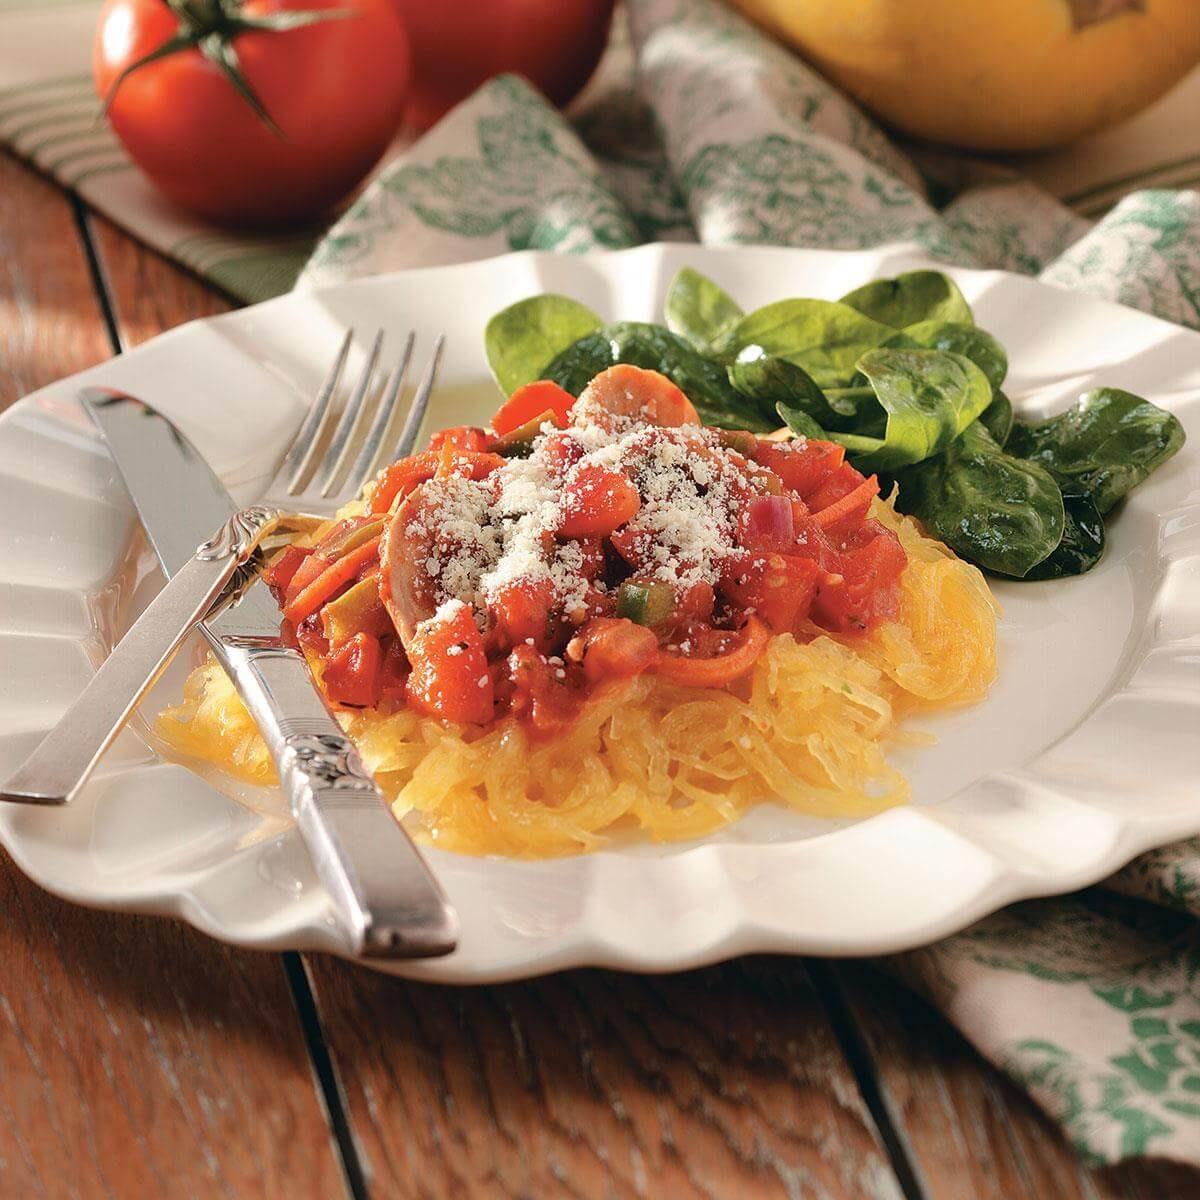 Spaghetti Squash With Red Sauce Recipe